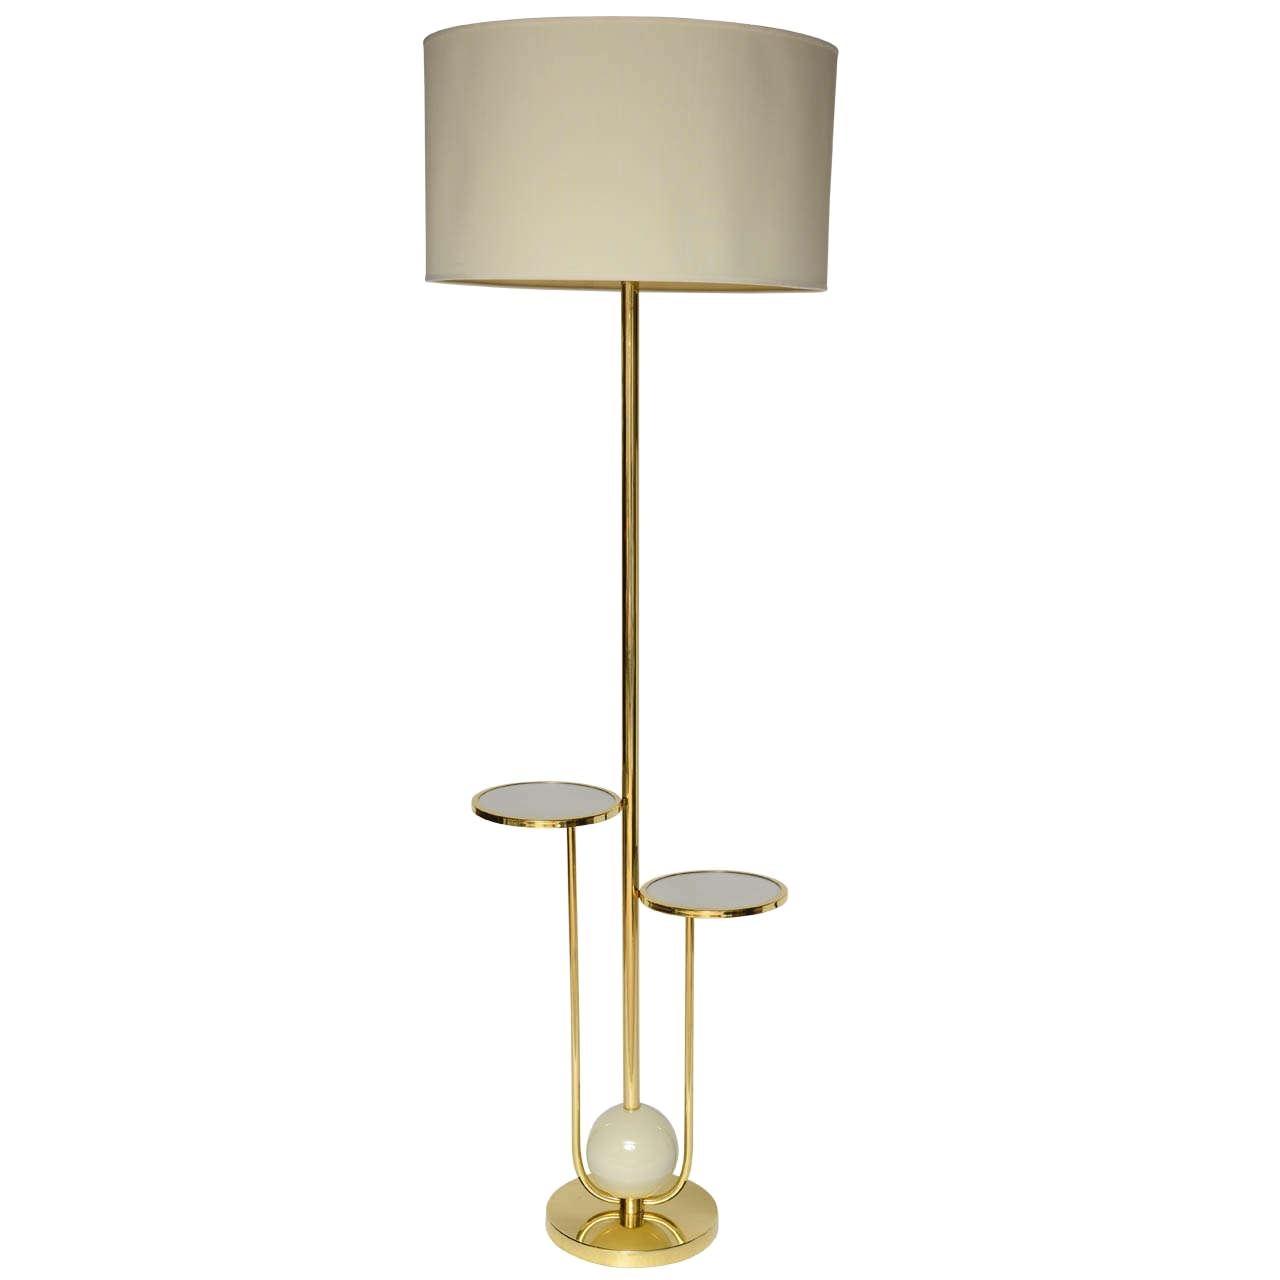 Tall Italian leather floor lamp